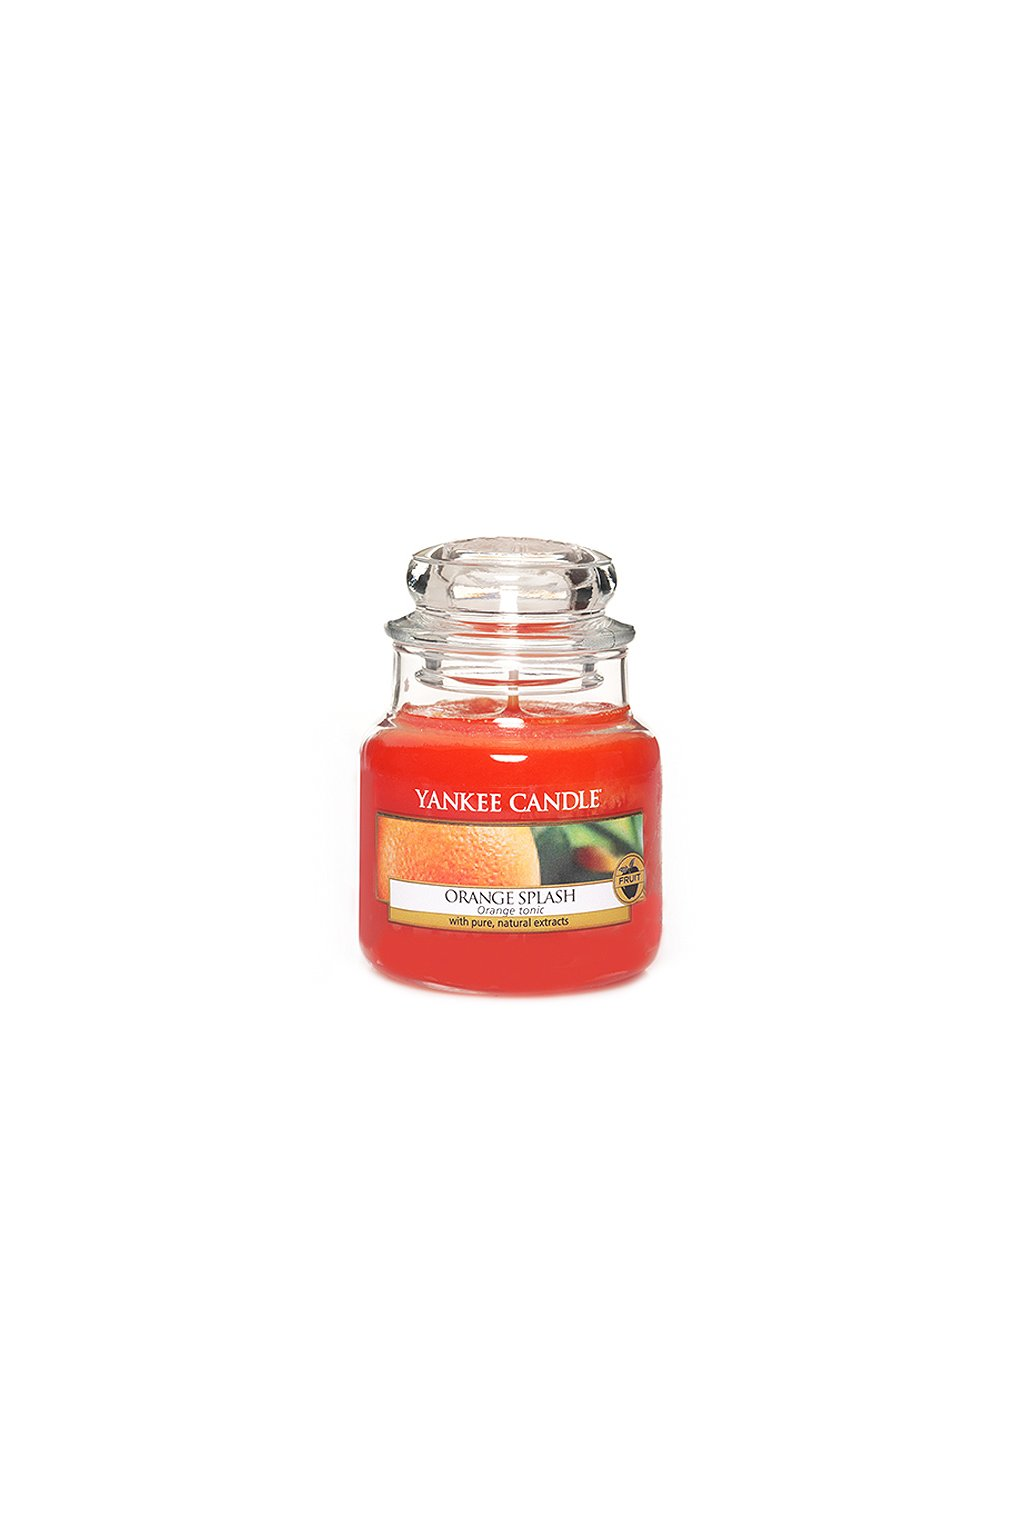 Yankee Candle Orange Splash 104g